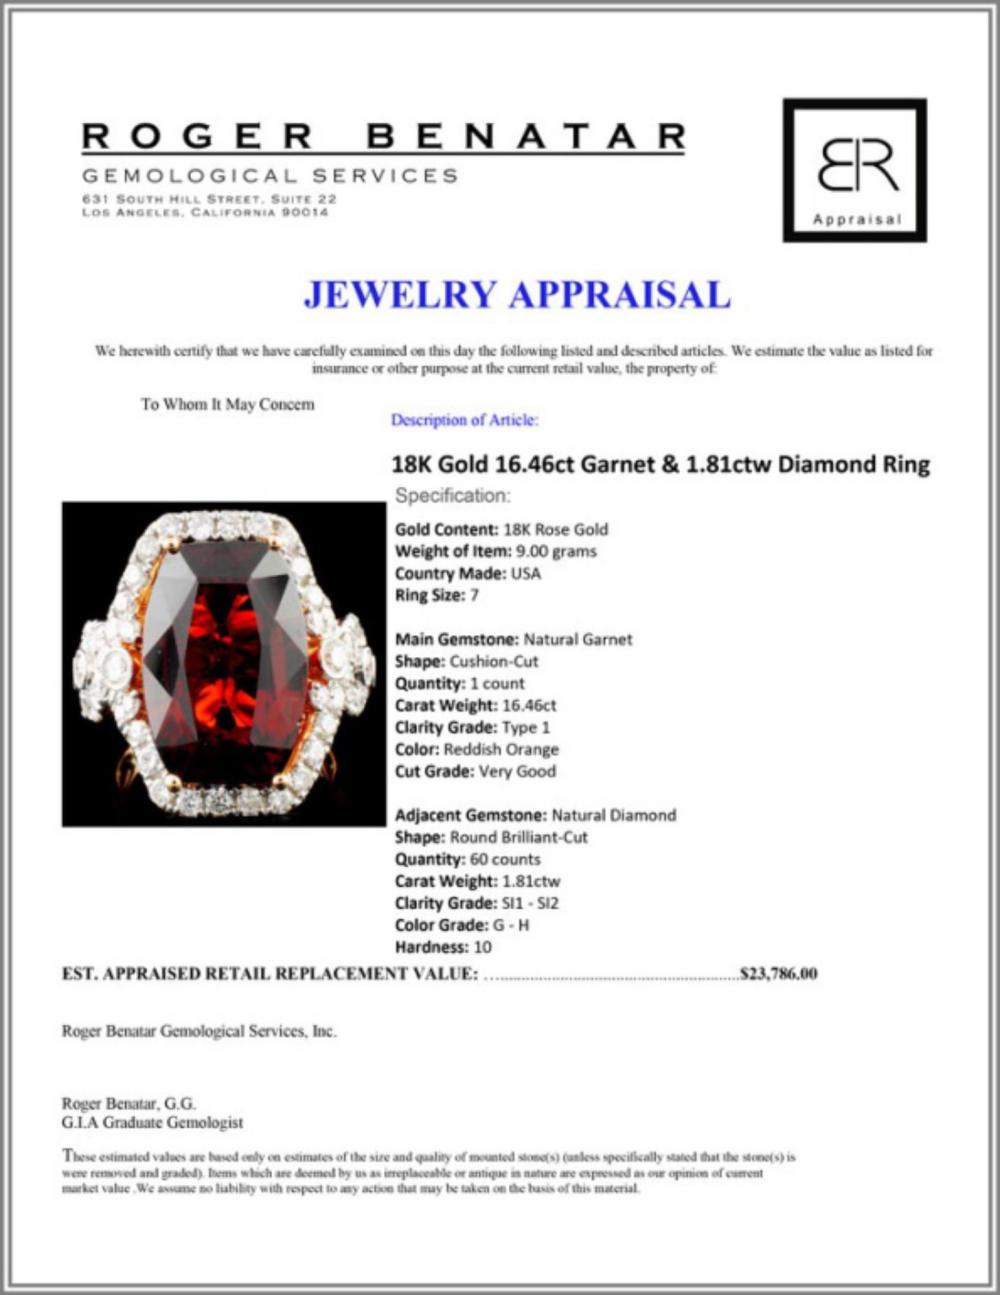 Lot 155: 18K Gold 16.46ct Garnet & 1.81ctw Diamond Ring